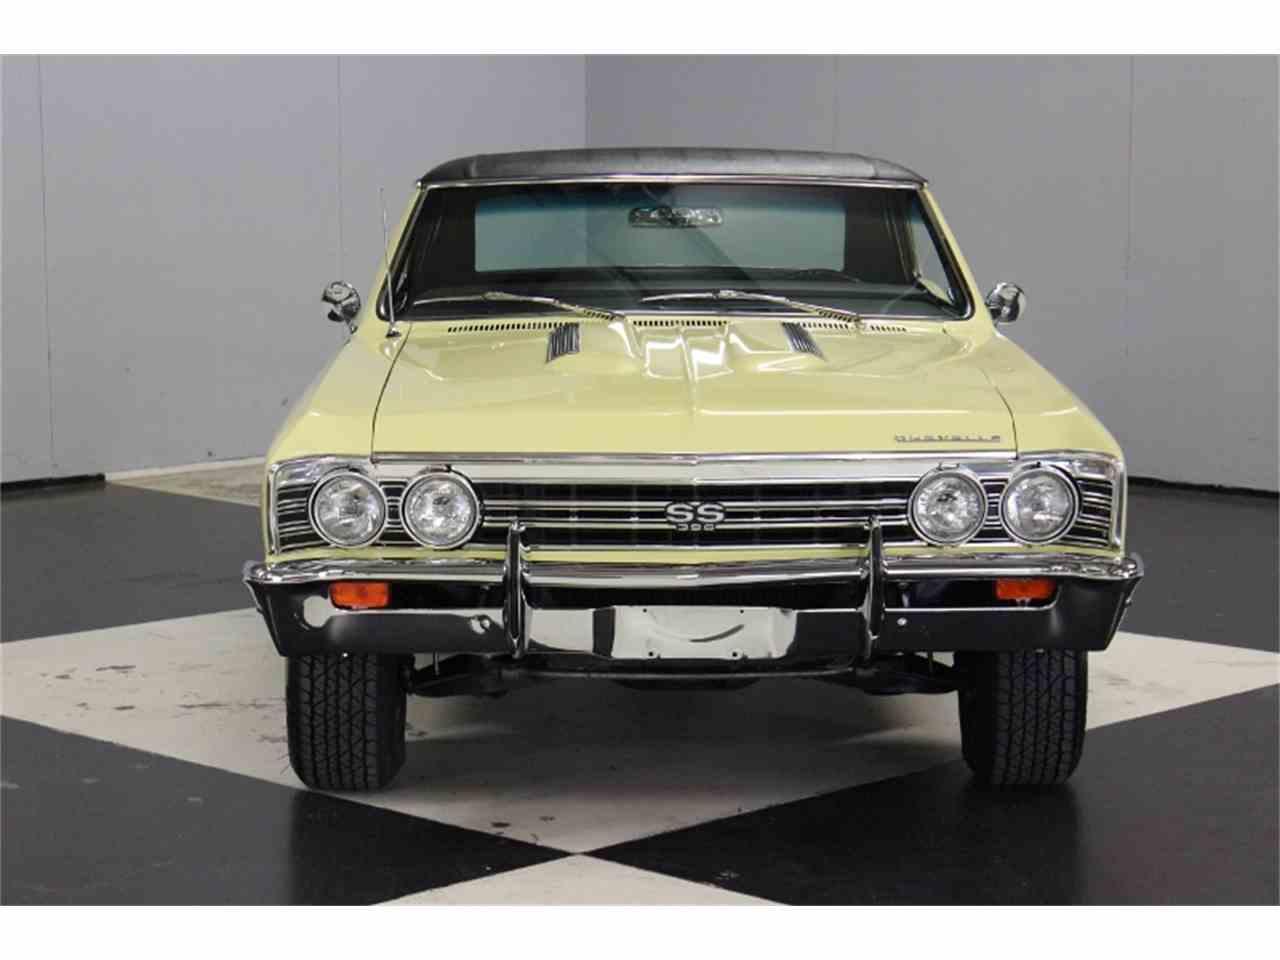 1967 Chevrolet Chevelle SS for Sale | ClassicCars.com | CC-922629